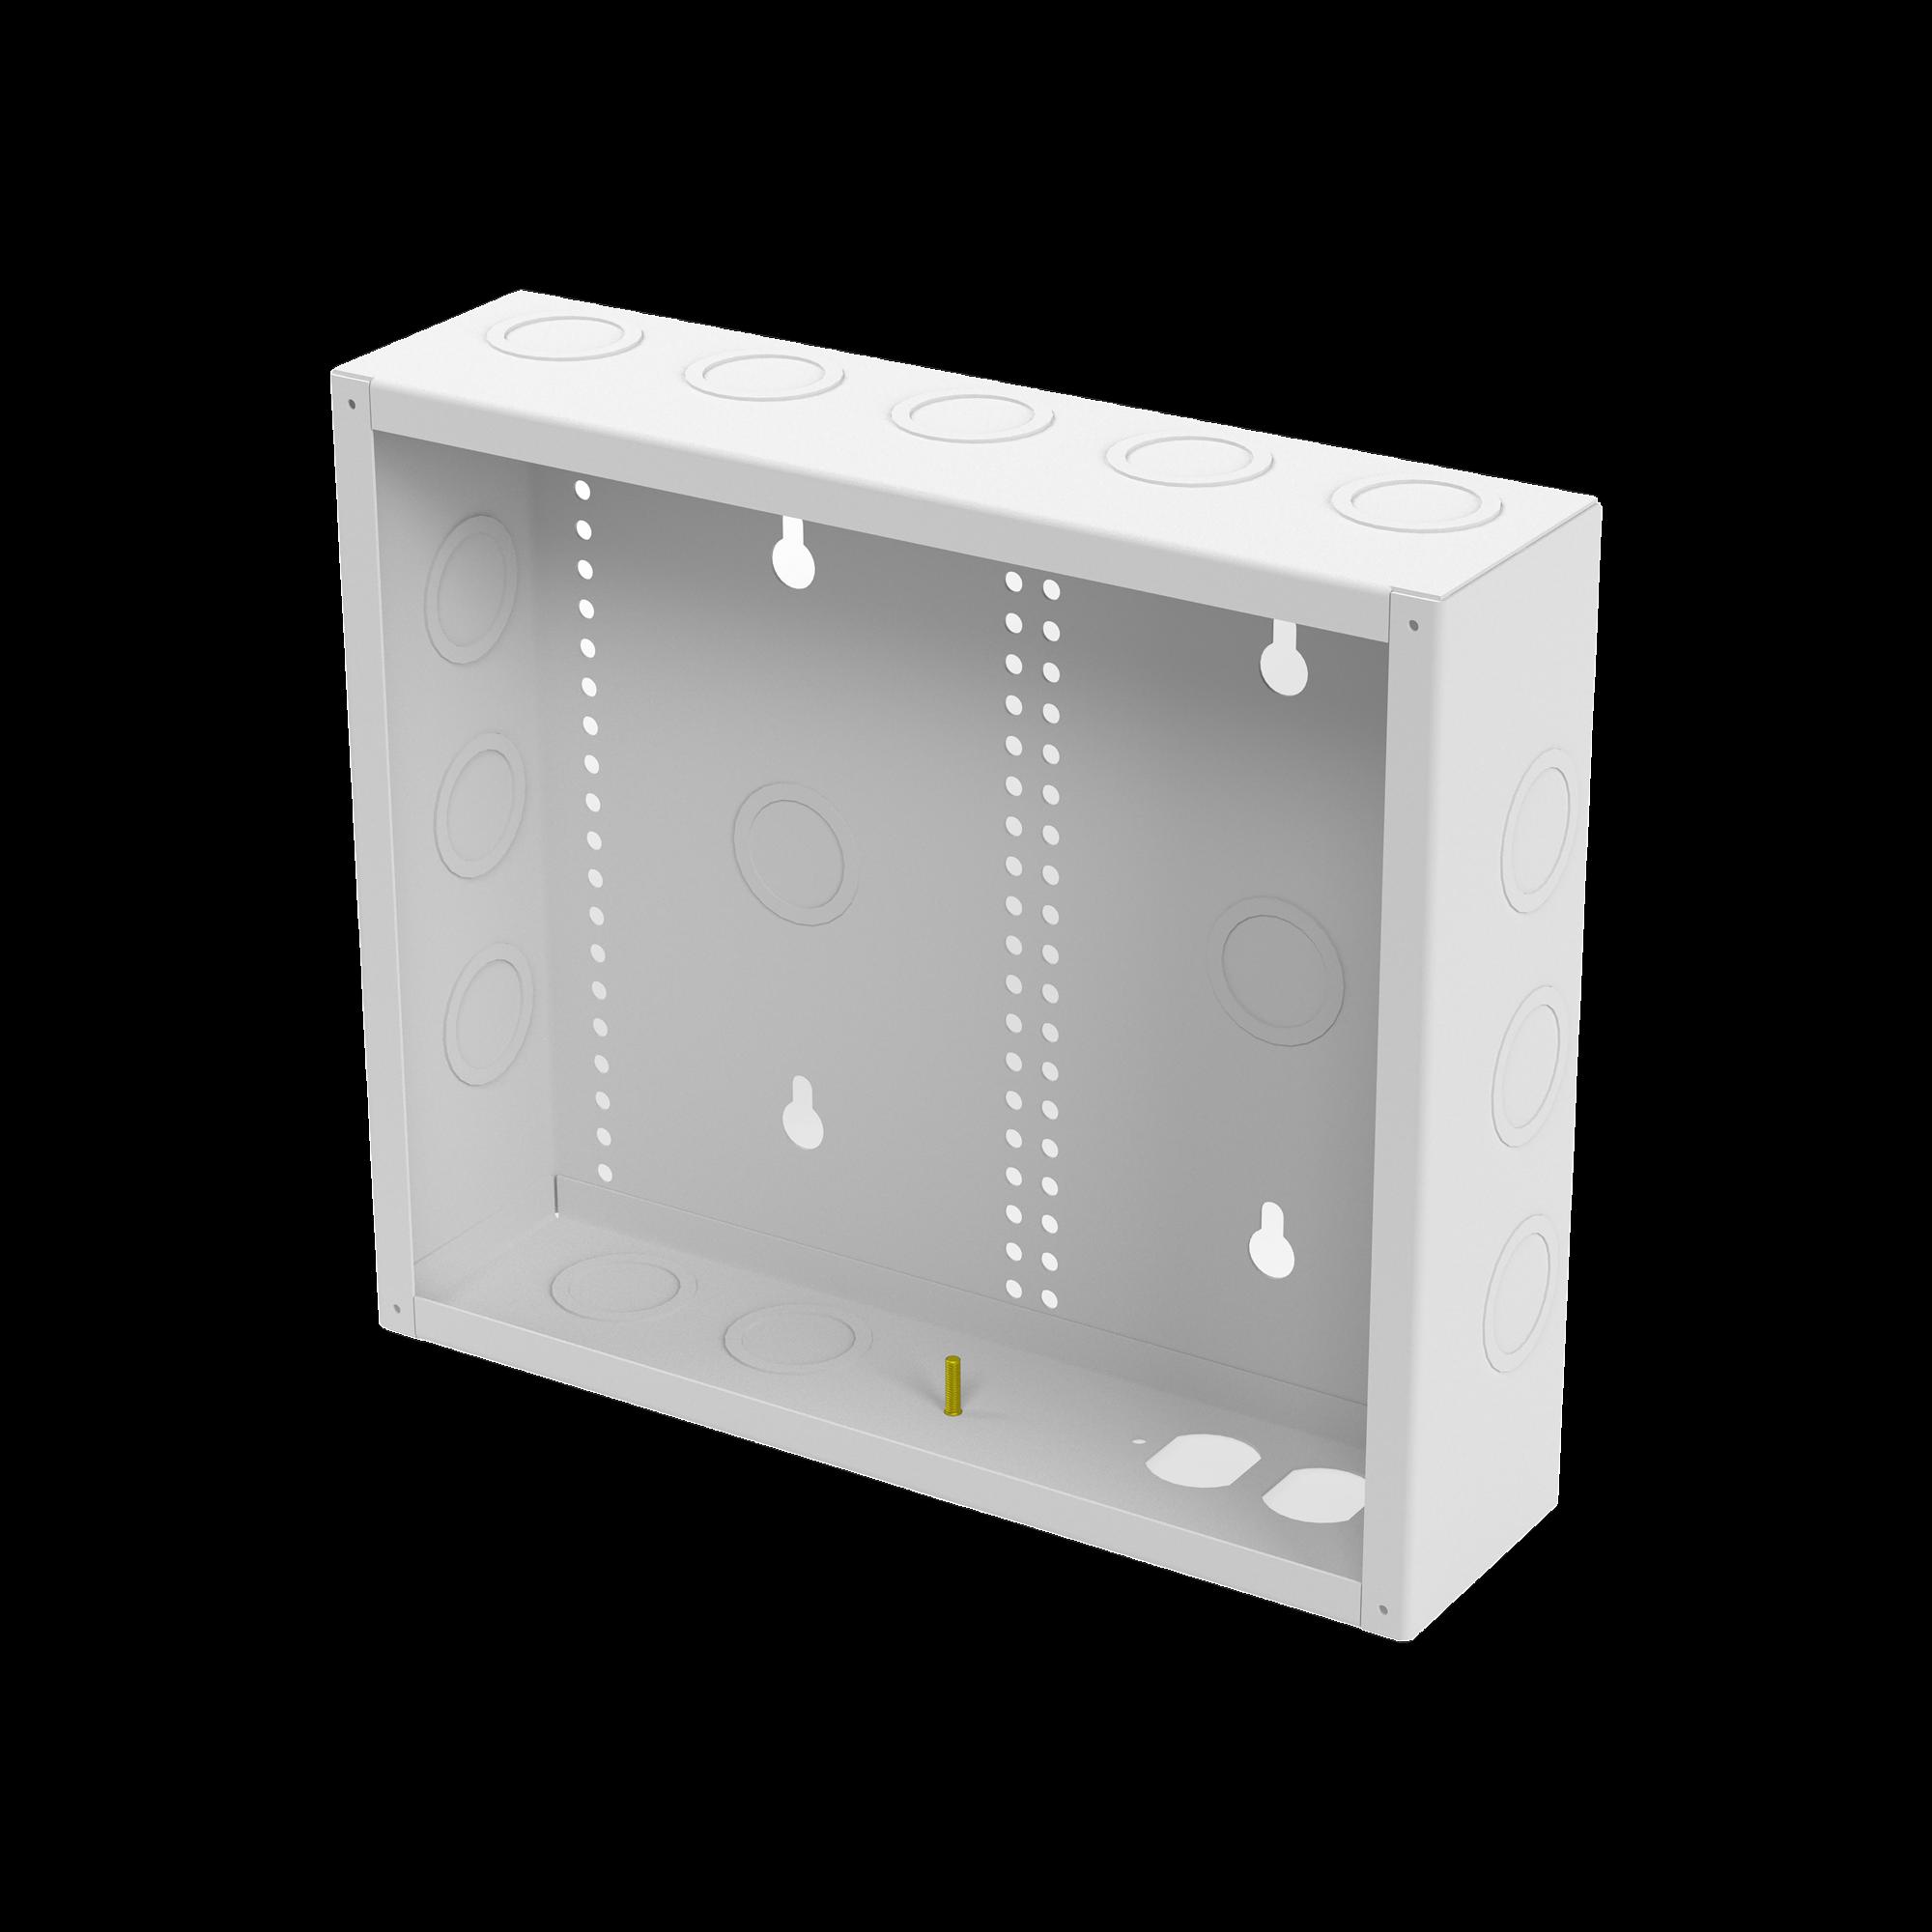 Gabinete de Medios de 12 Pulgadas de Alto,  para Empotrar en Pared (360 x 309 x 95 mm)